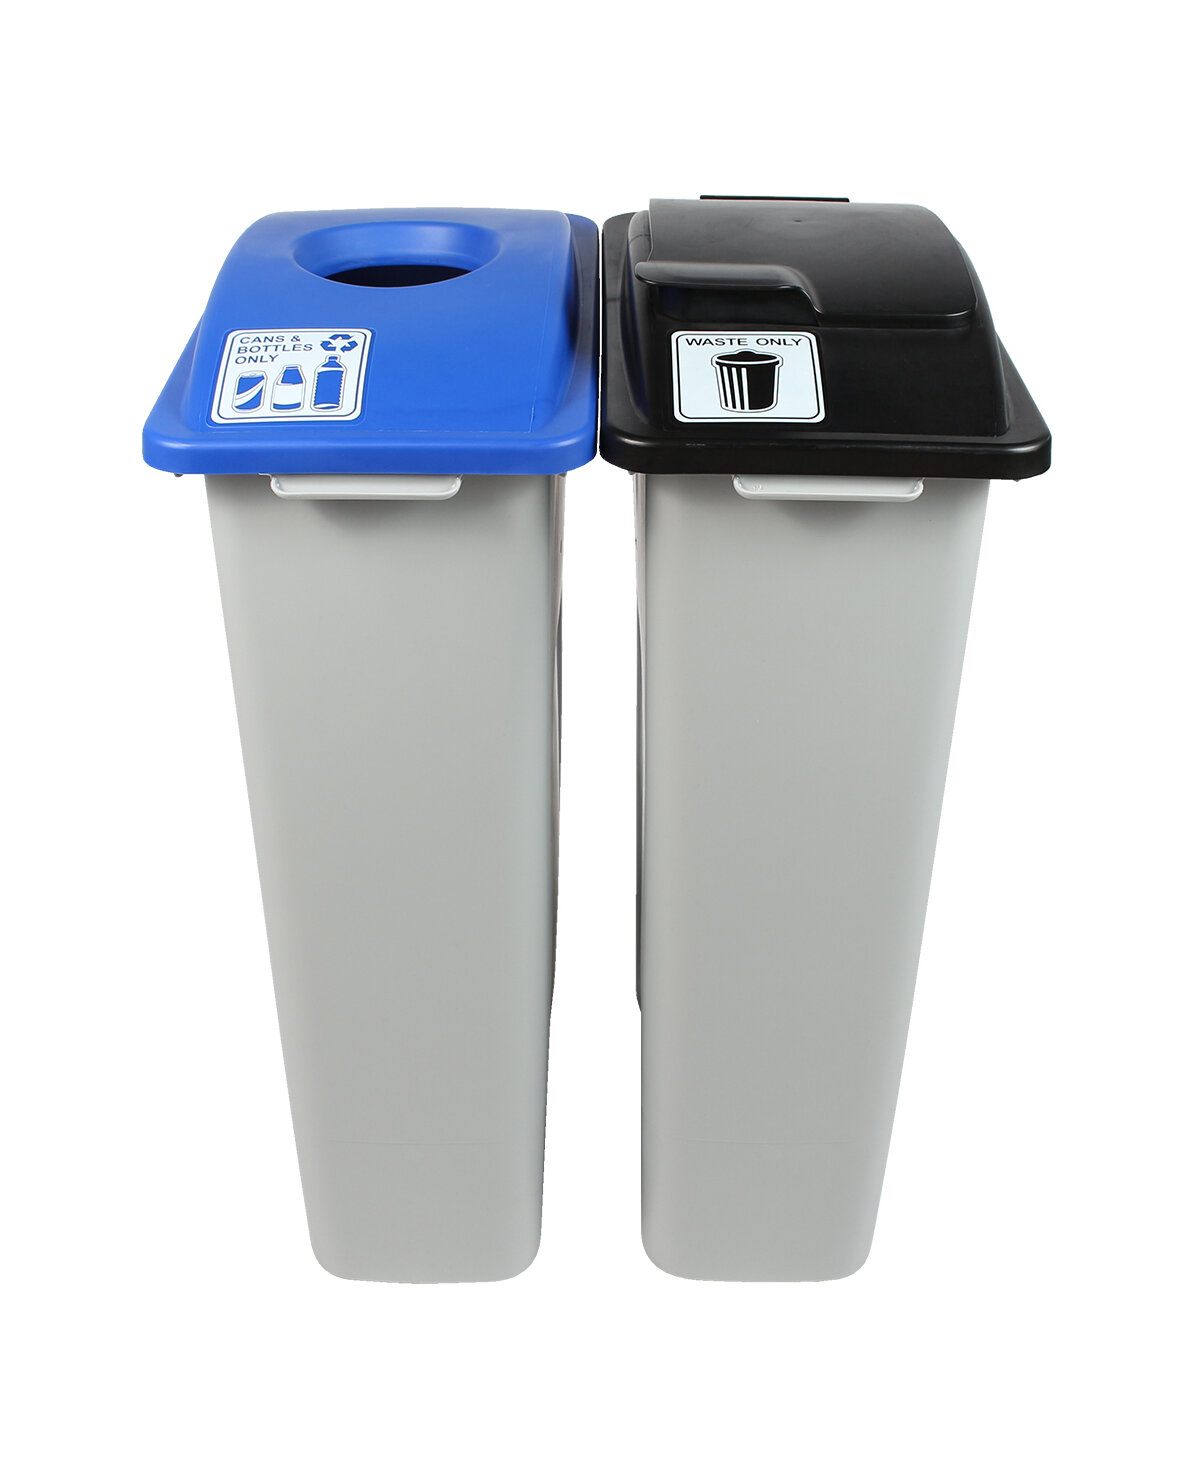 41 50 Gallon Trash Recycling You Ll Love In 2021 Wayfair Ca